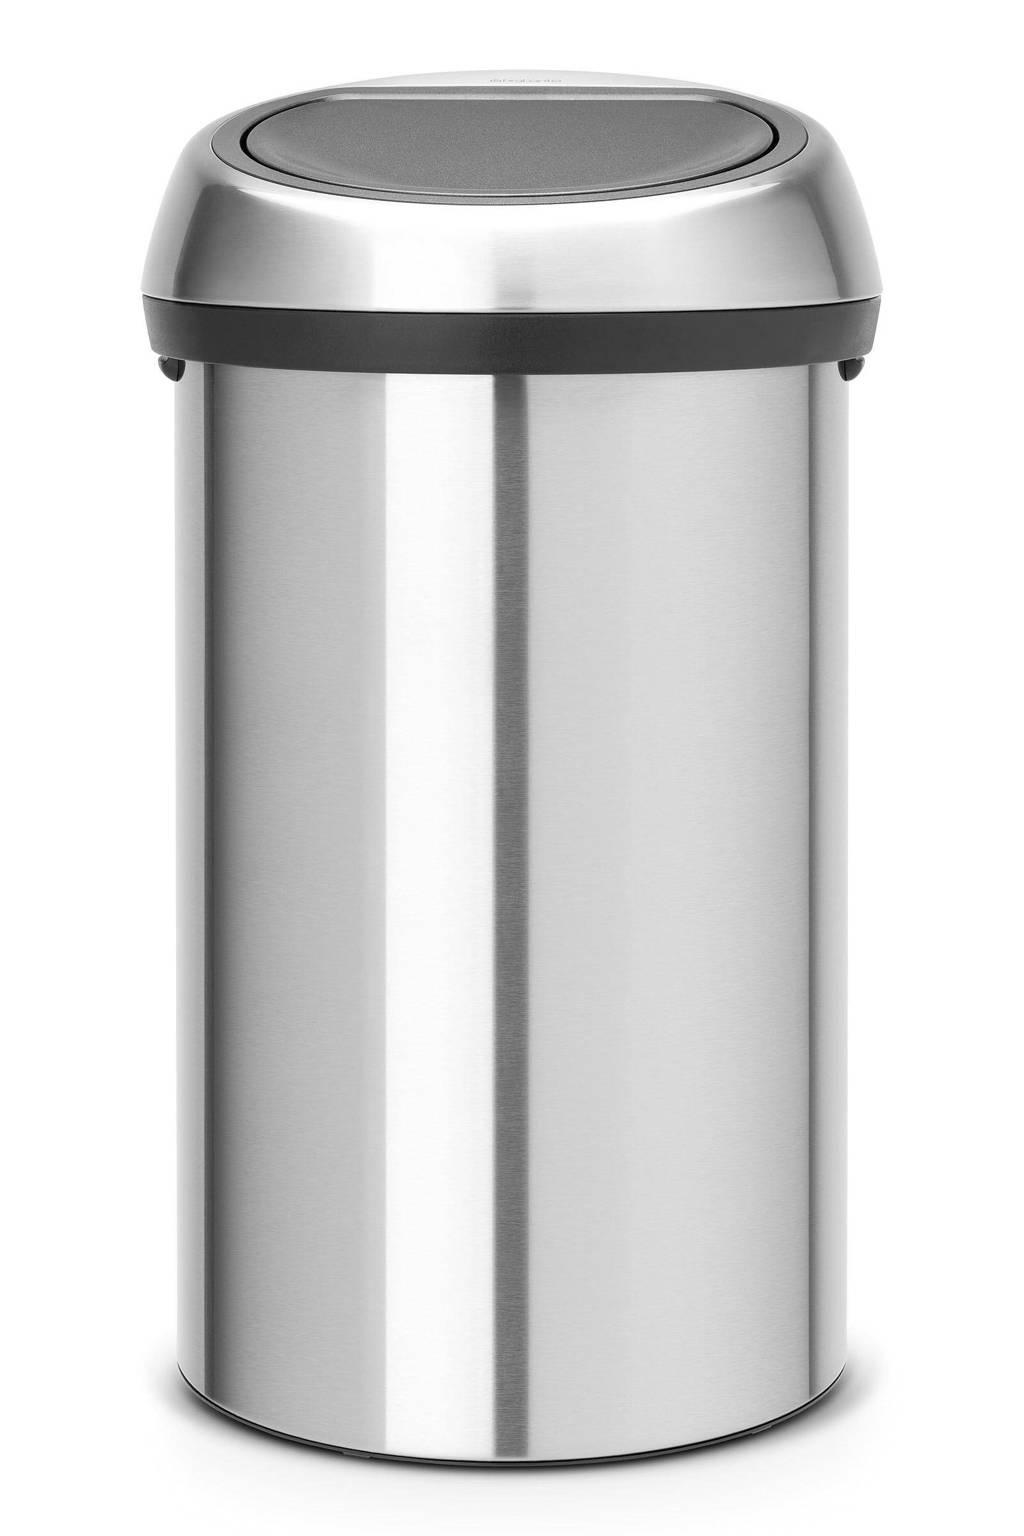 Brabantia Touch Bin 50 Liter Zwart.Brabantia Touch Bin 60 Liter Prullenbak Wehkamp